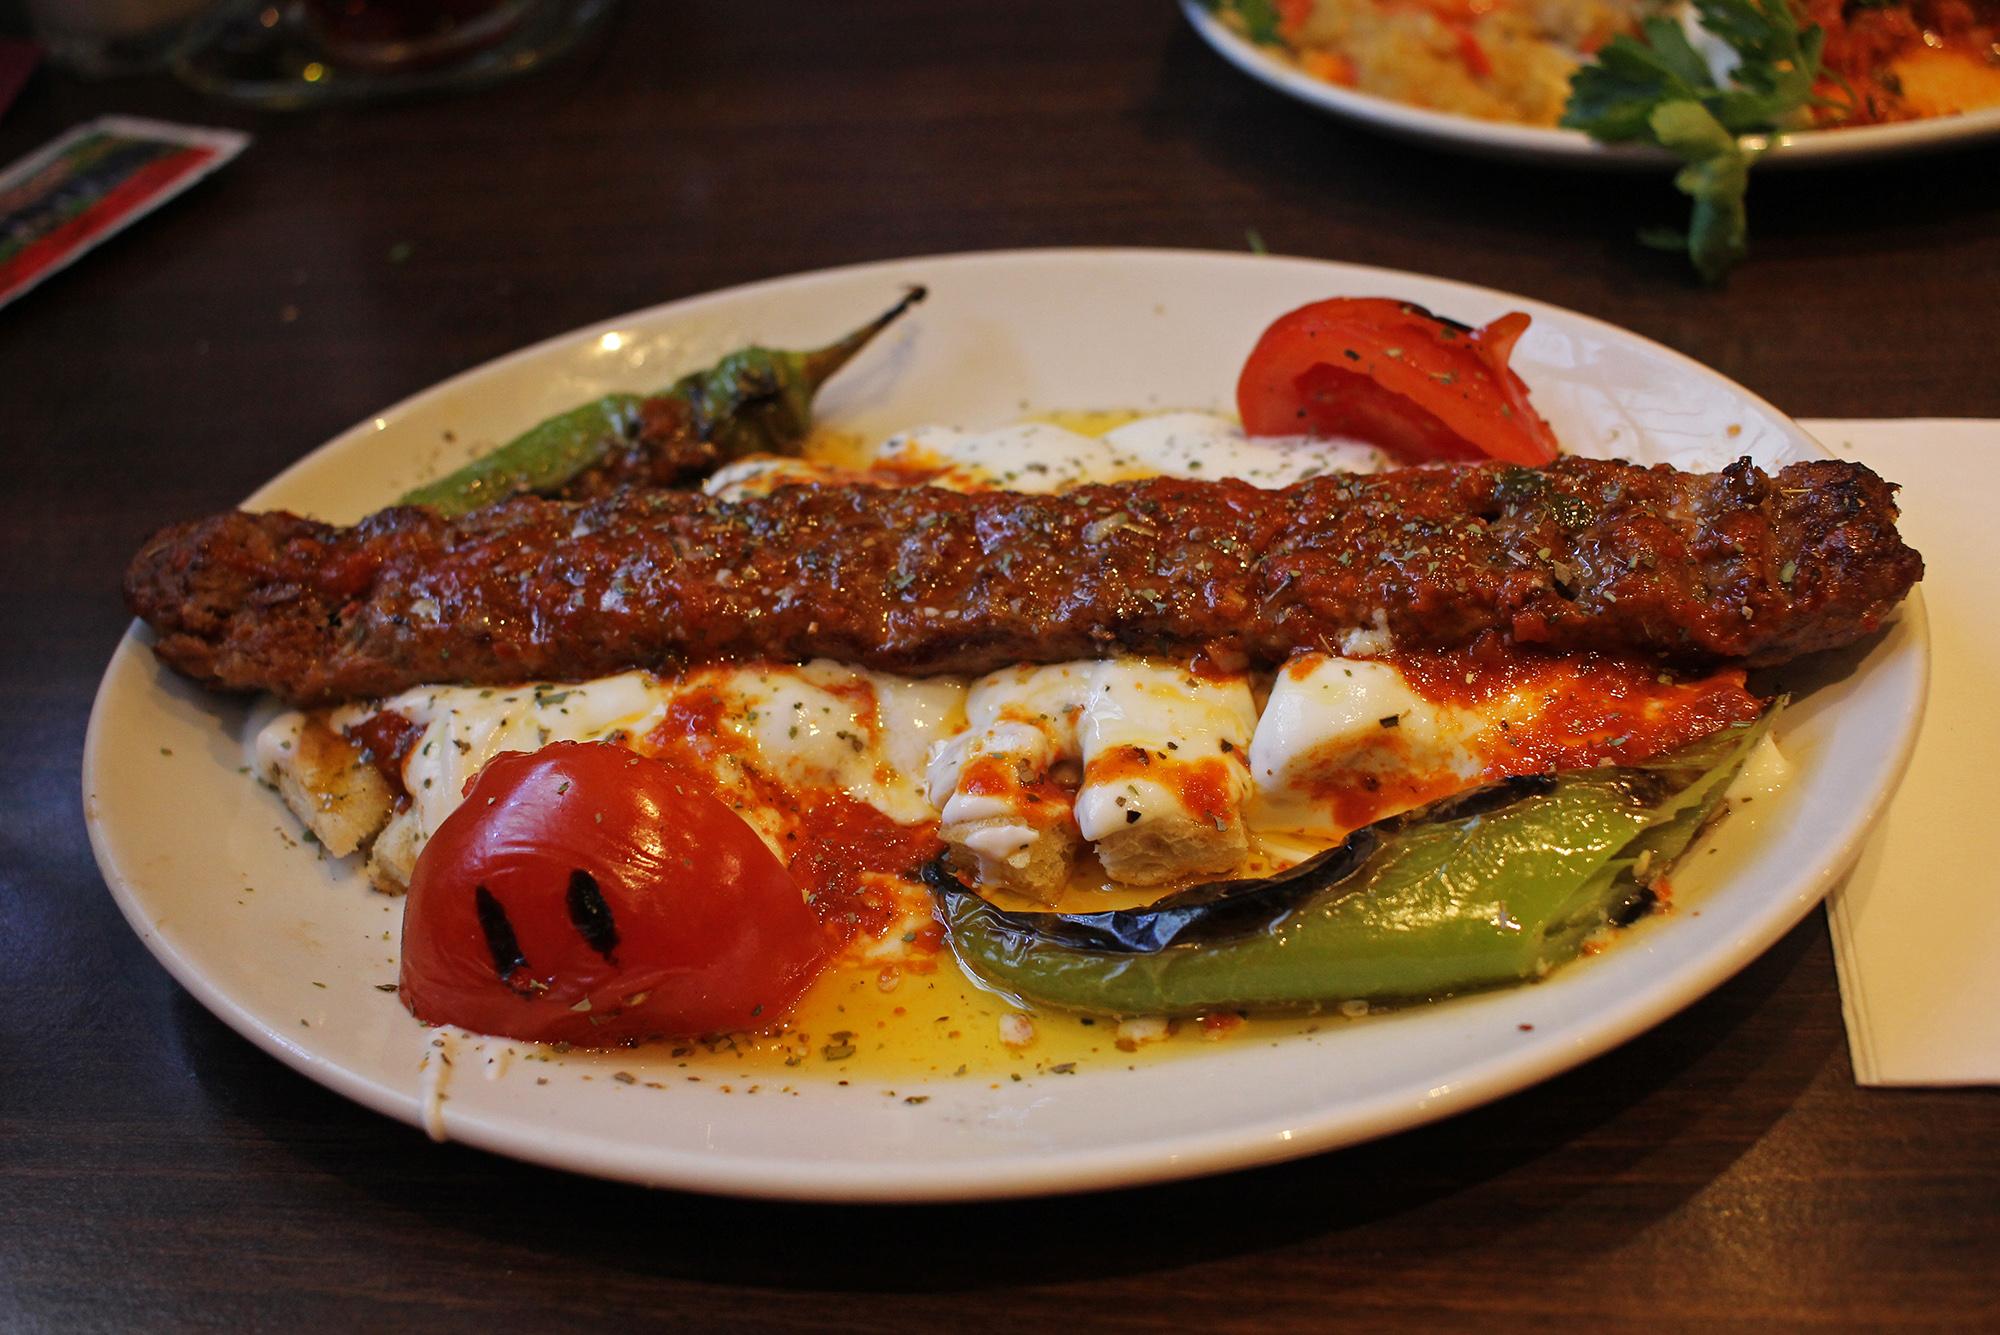 Yoğurtlu Adana at Caglayan Grillhaus Berlin